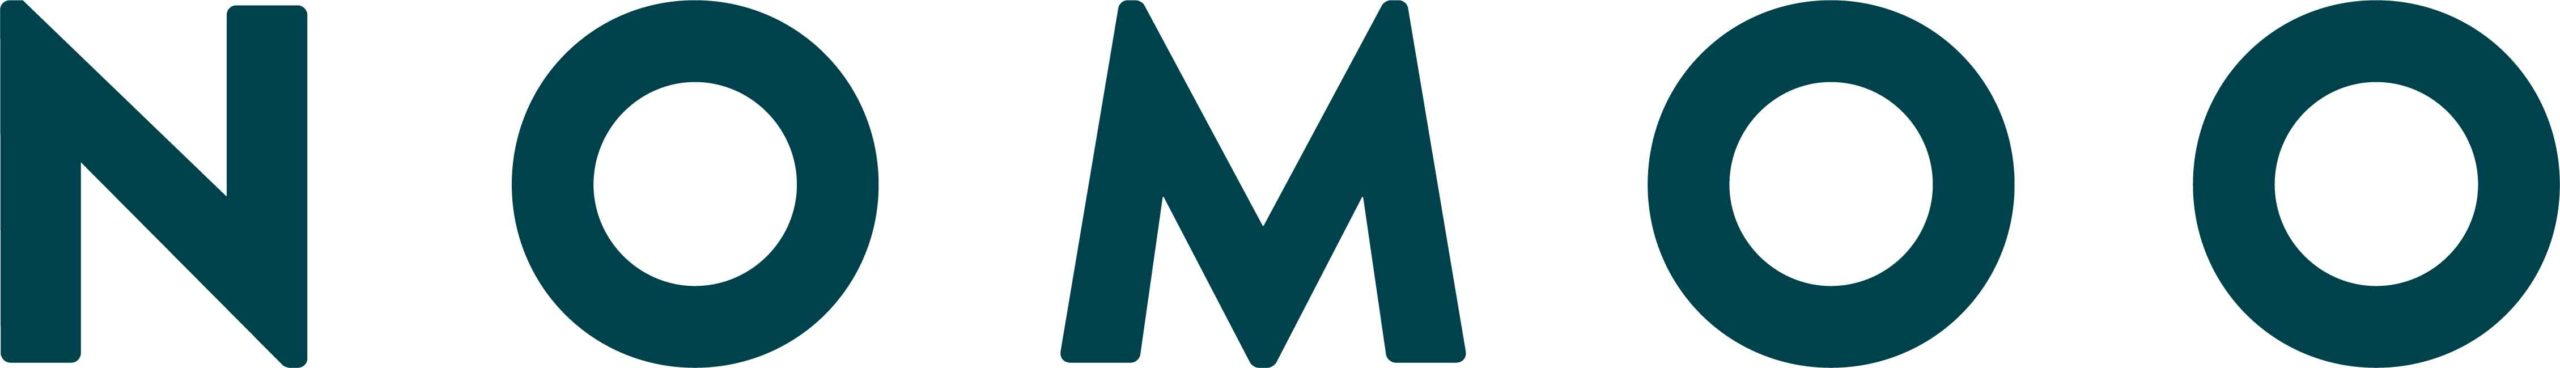 NOMOO logo RGB green 8aee028f1a38c51f0571367d5ac0ed3e scaled